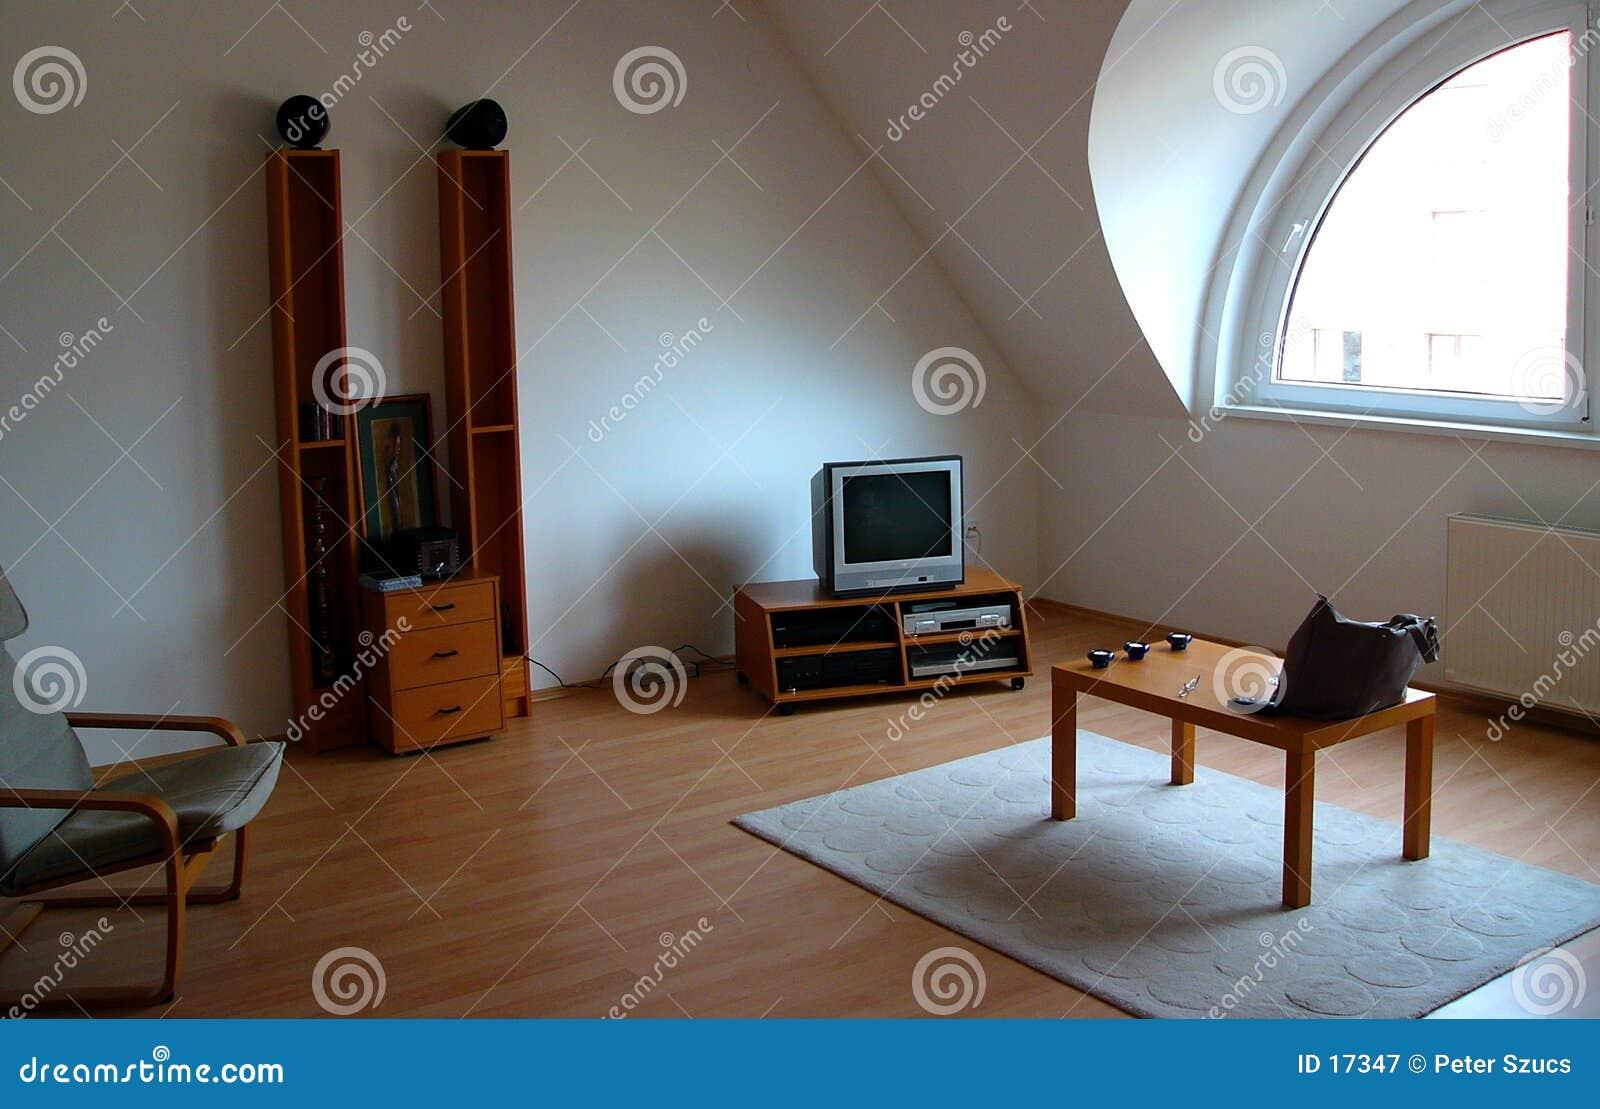 2 mieszkanie.